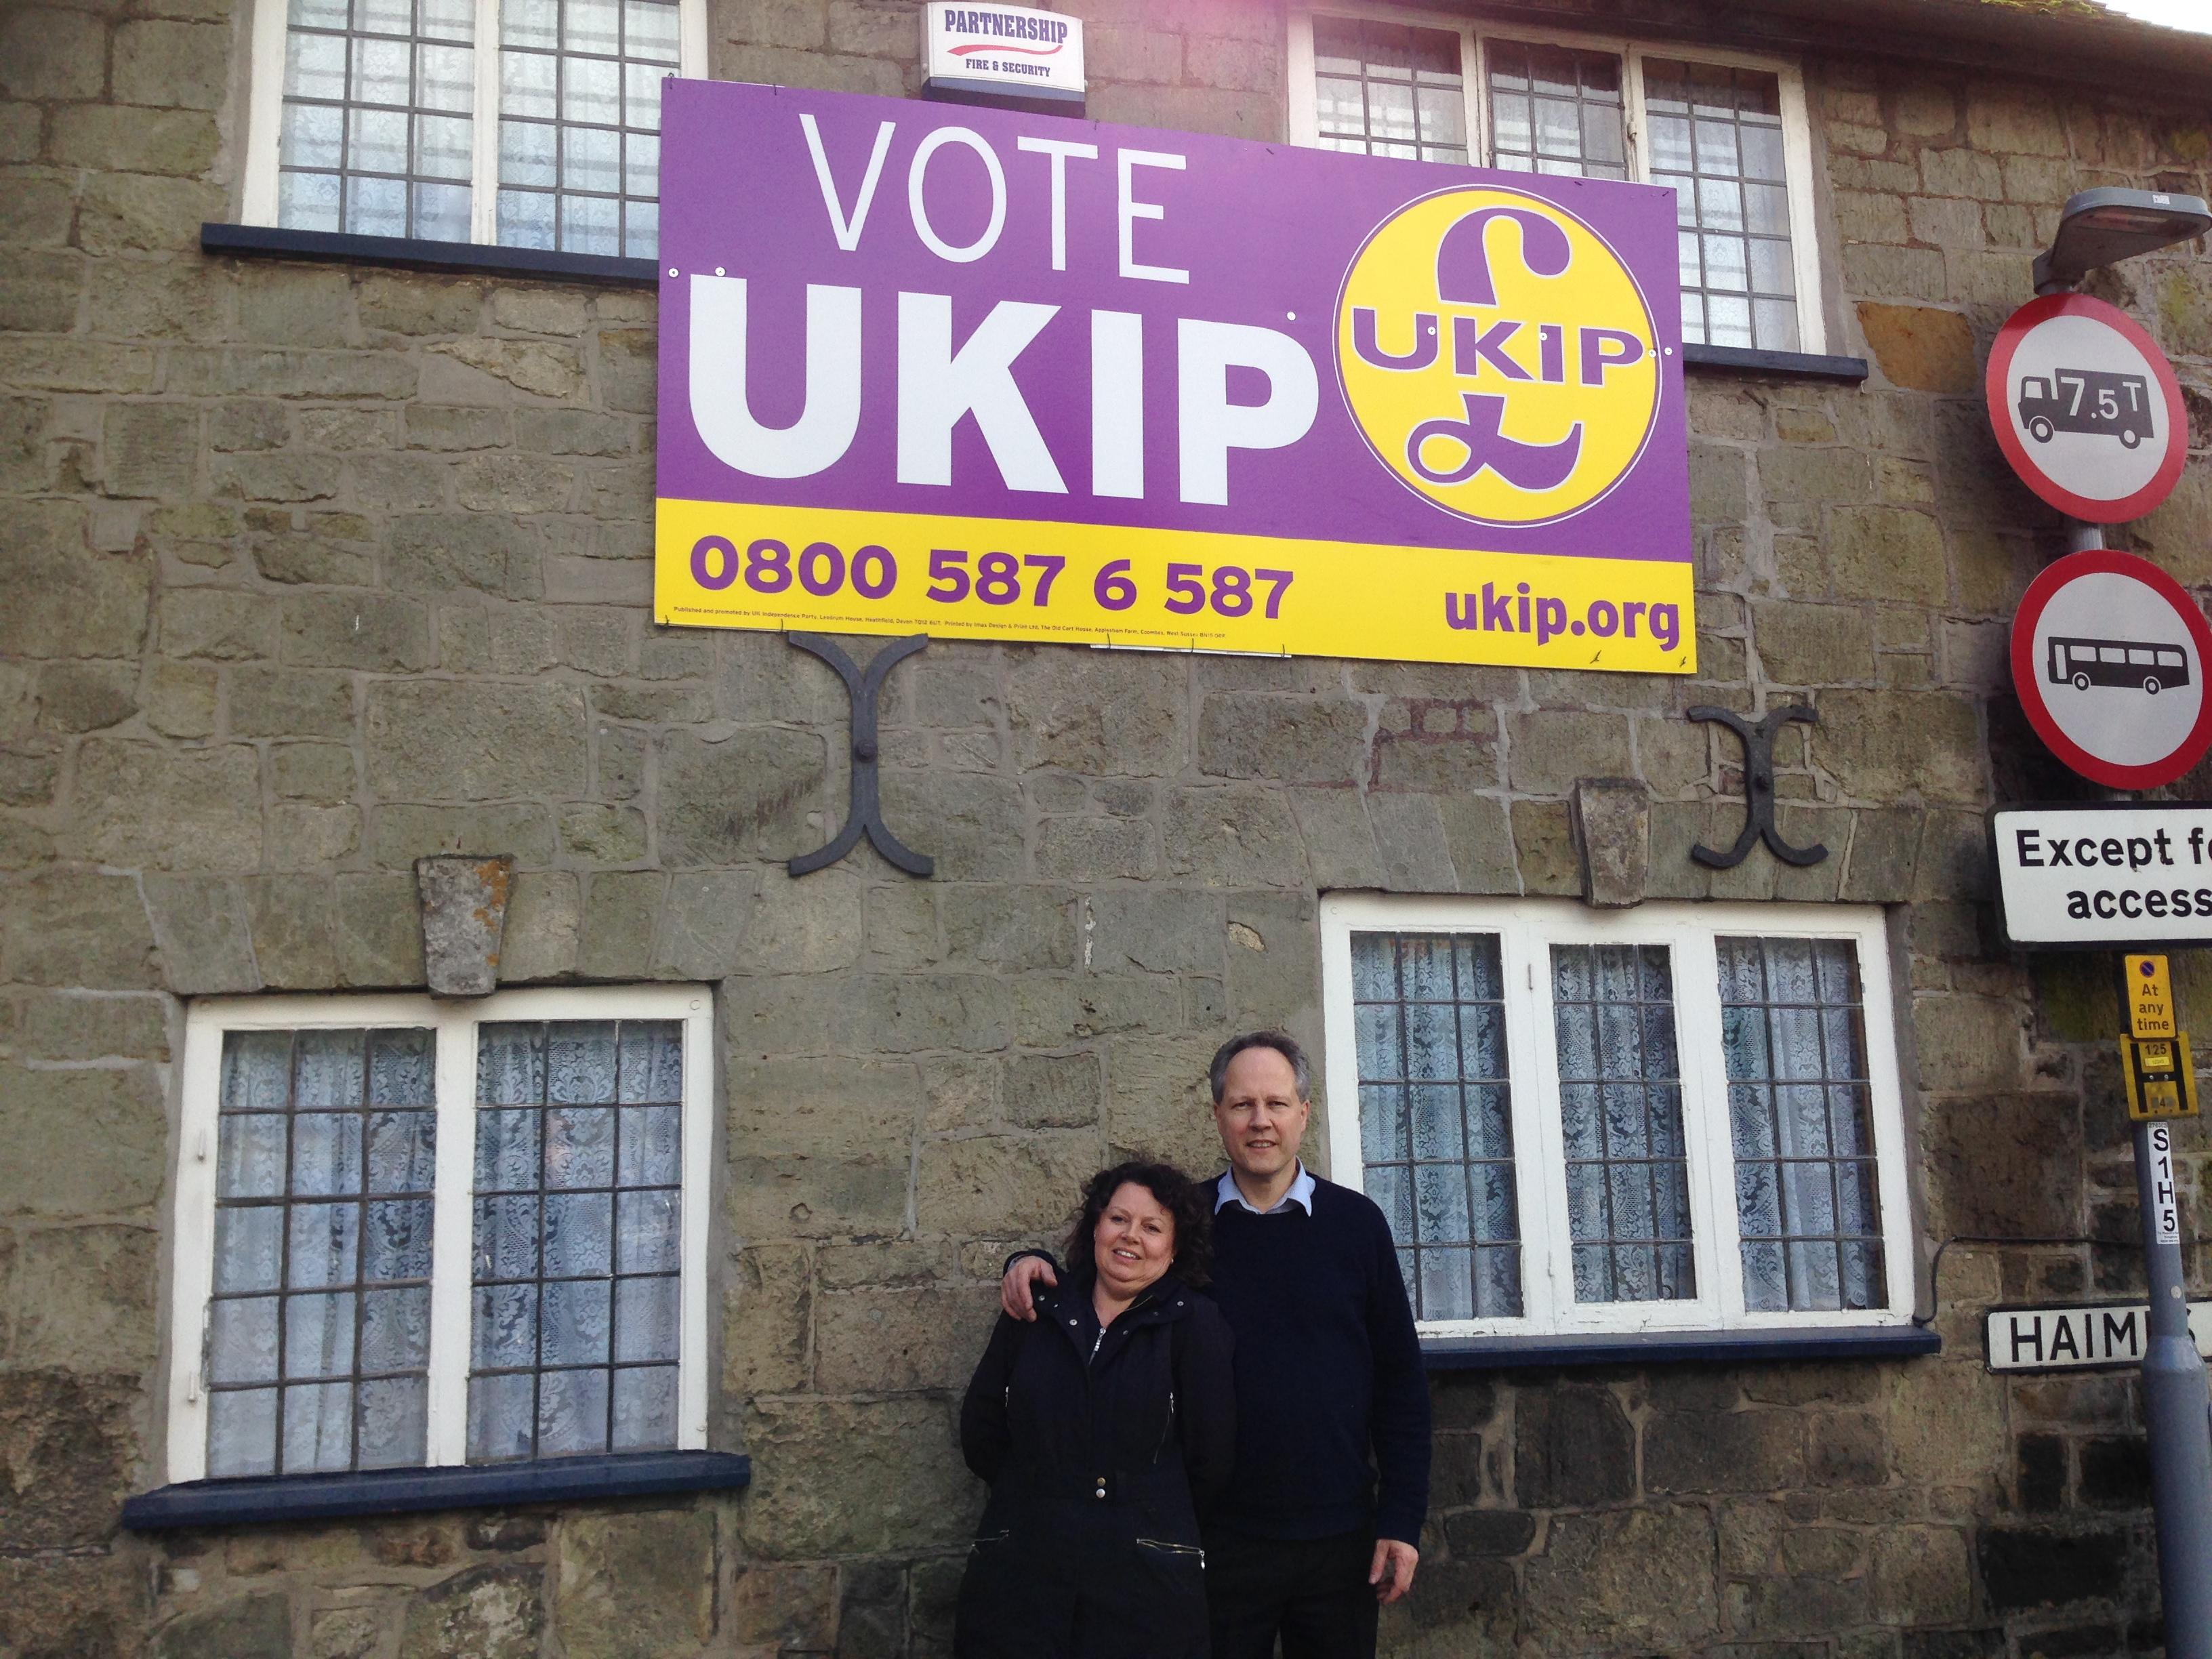 Steve Unwin and UKIP Poster